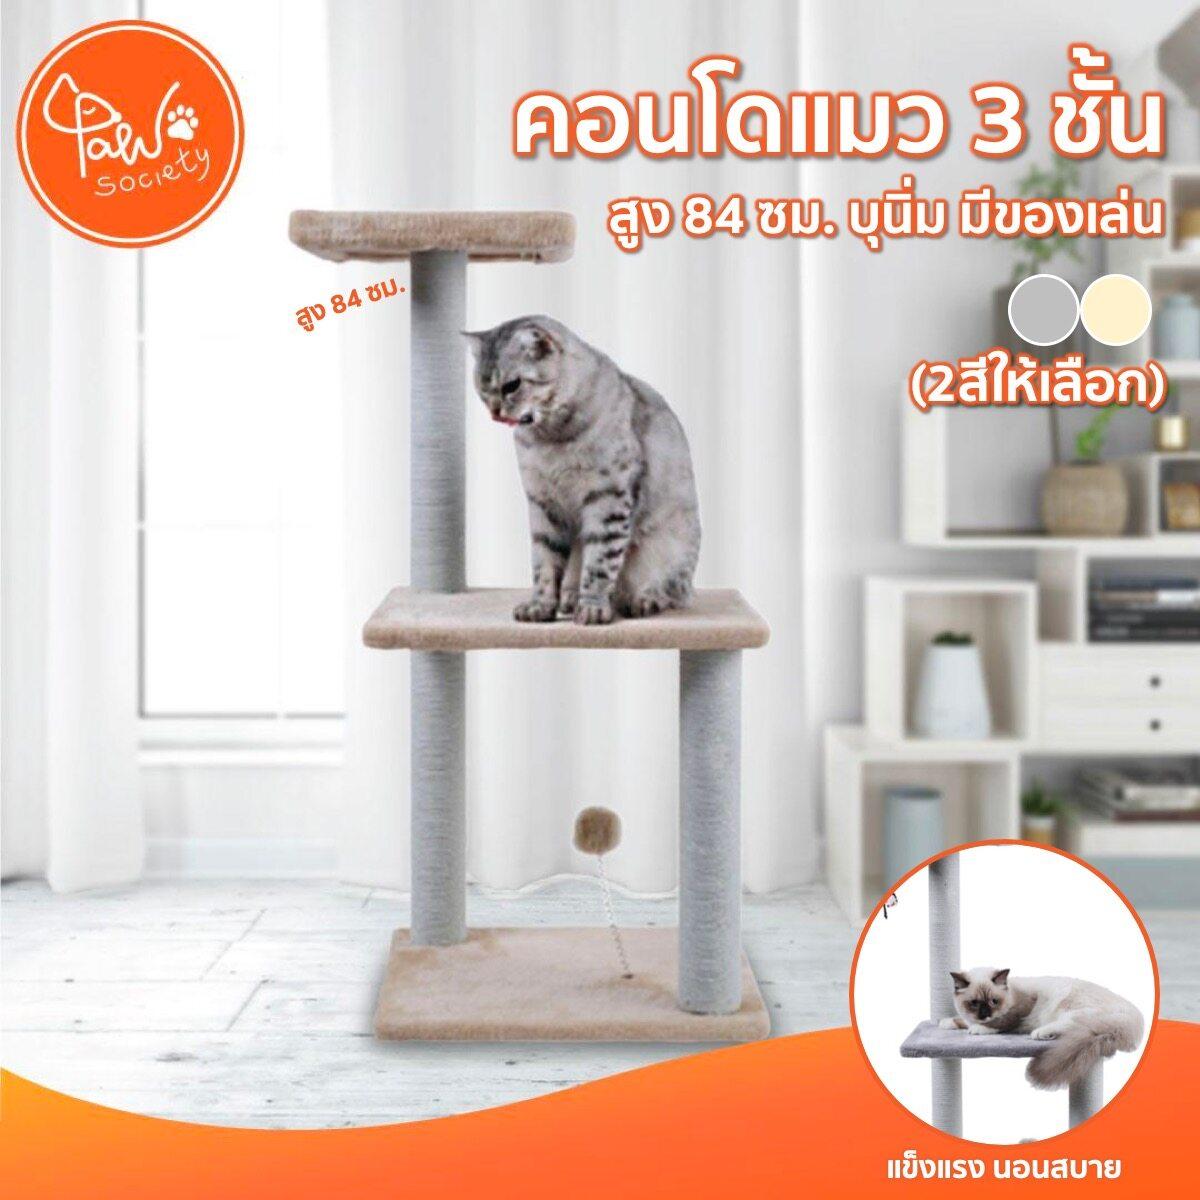 PawSociety คอนโดแมว 3 ชั้น สูง 84 ซม. พร้อมของเล่น ลูกบอลปริง และ หนูล่อแมว